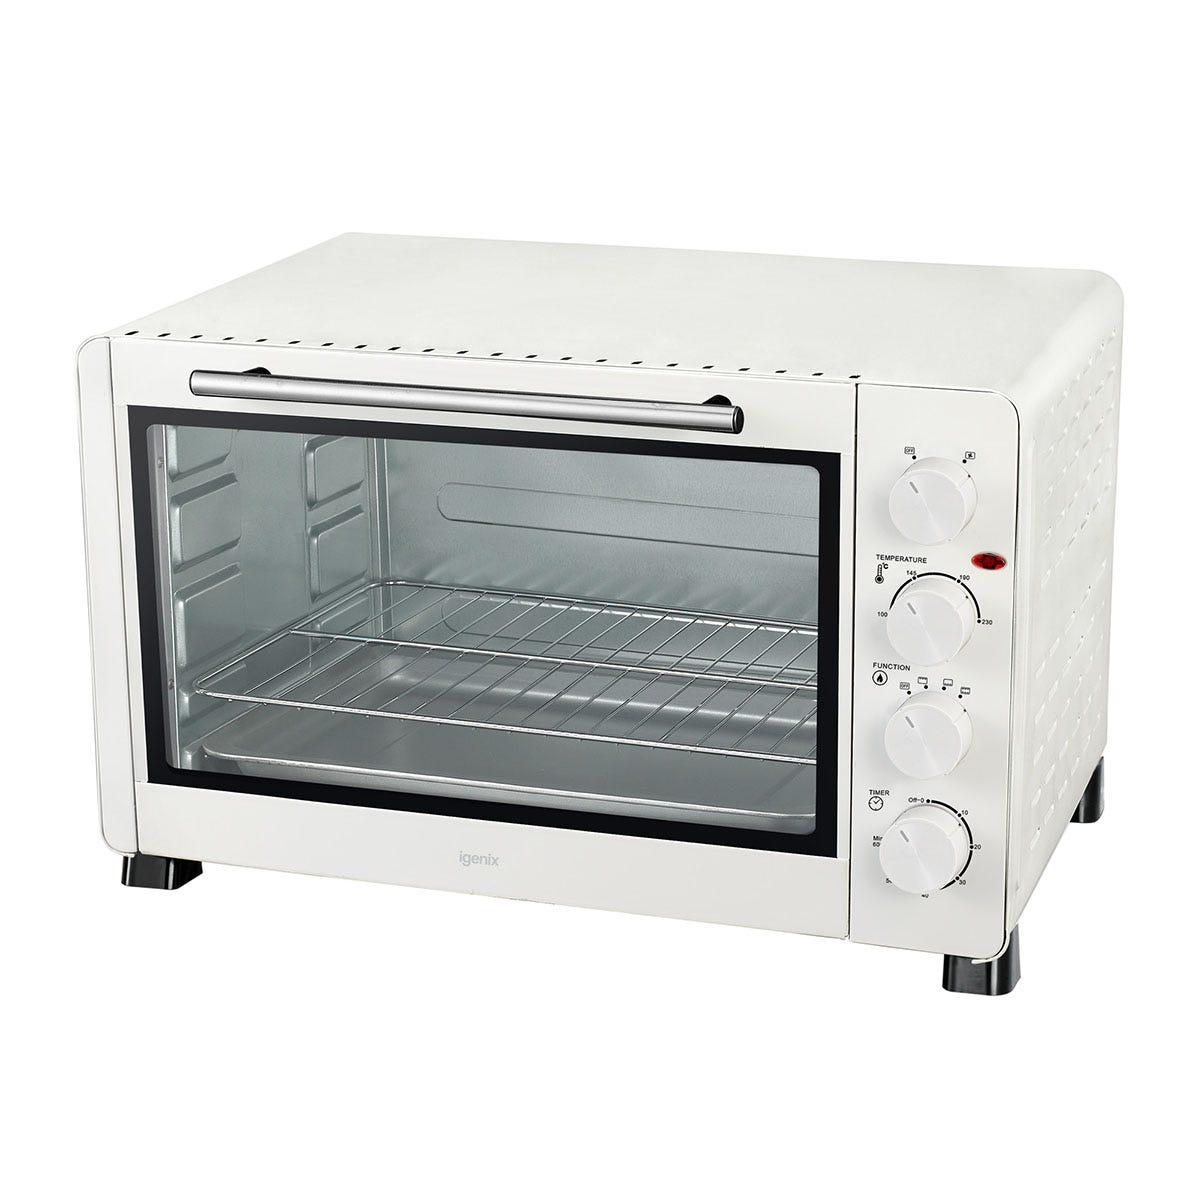 Igenix IG7161 60L 2500W Electric Mini Oven - White